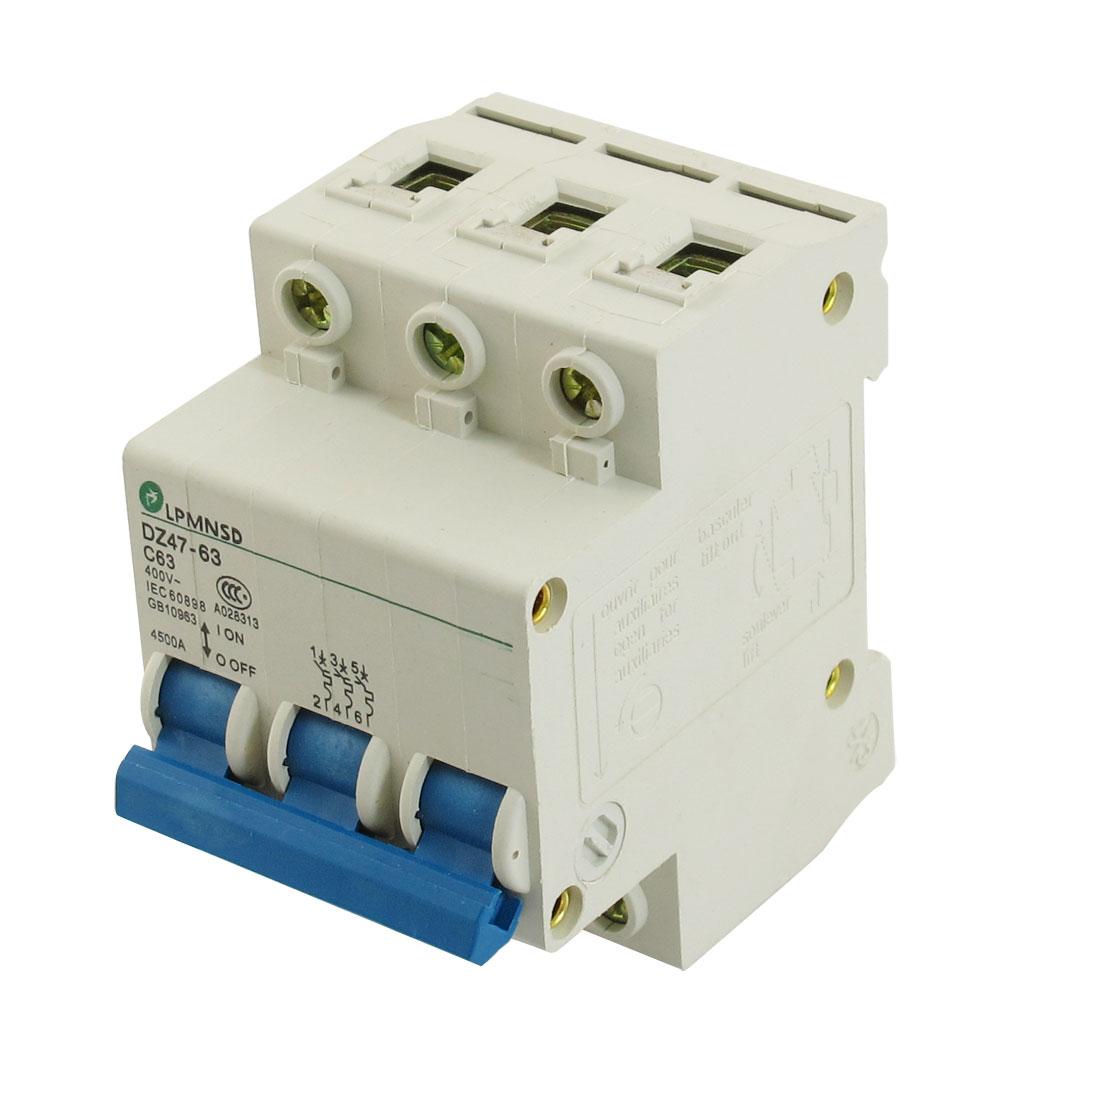 DZ47-63 C63 63A 400VAC 4500A Breaking Capacity 3 Poles Circuit Breaker